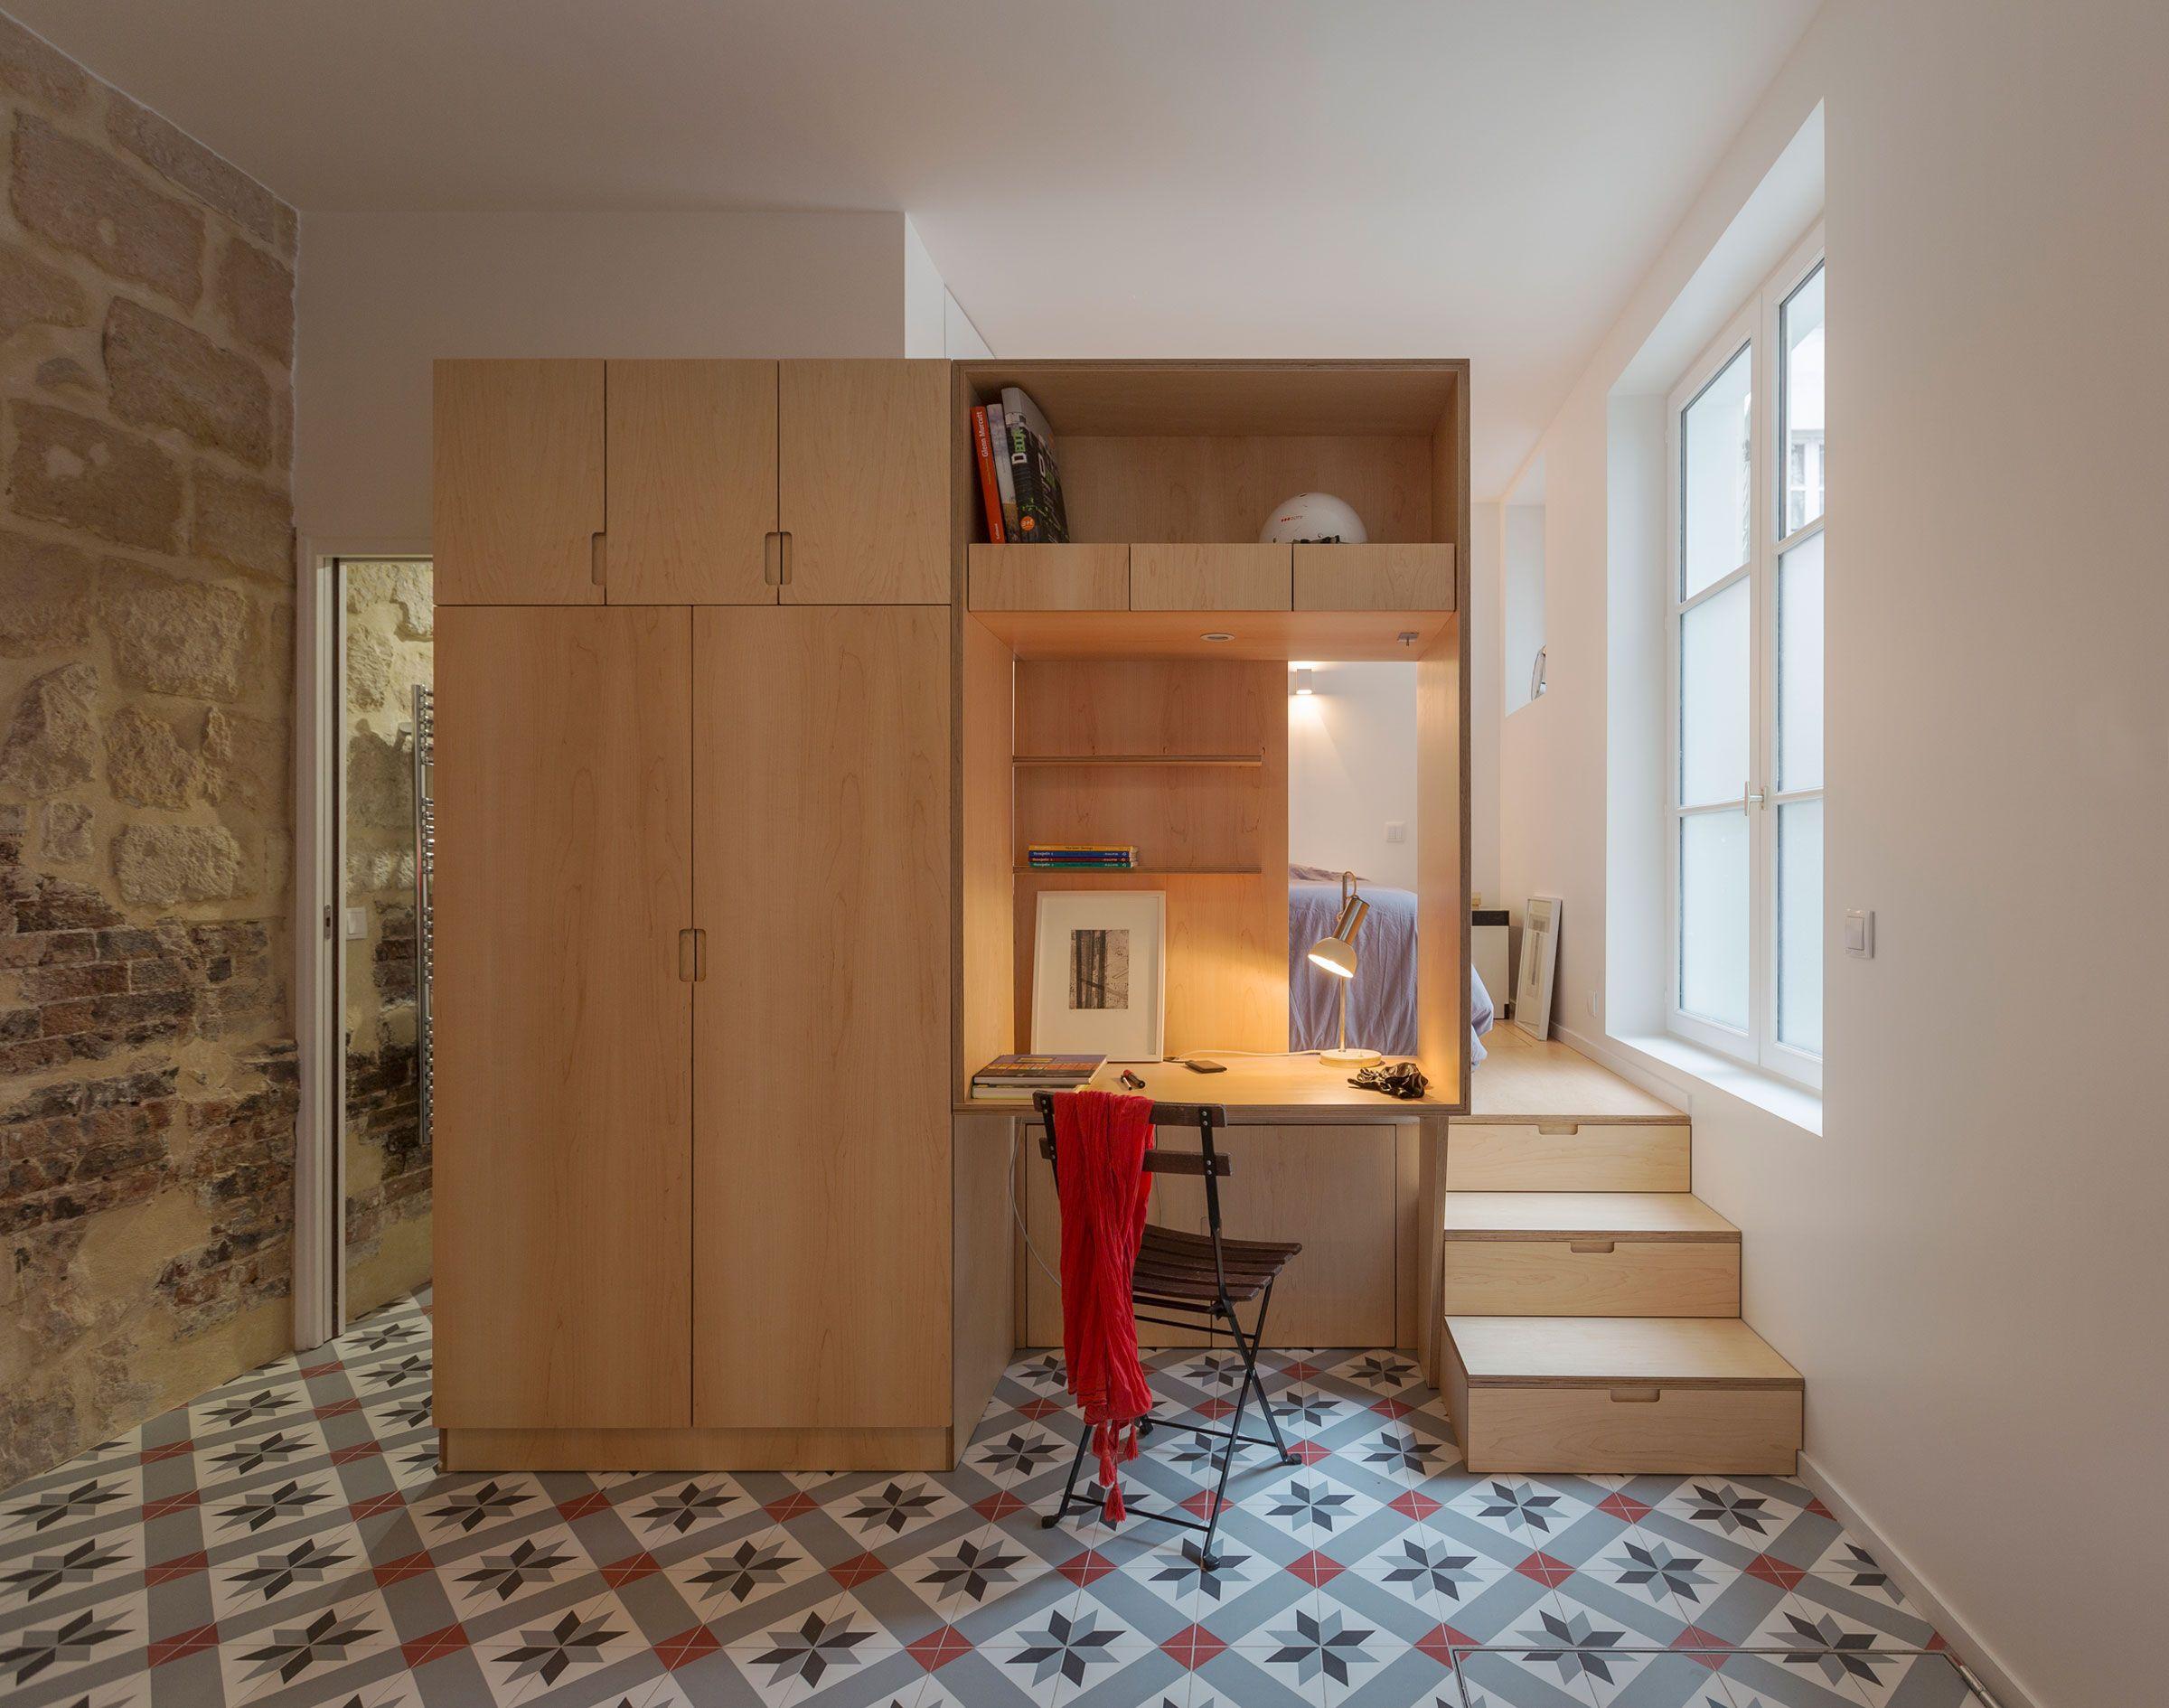 Anne rolland architecte studio li bureau house flat kitchen